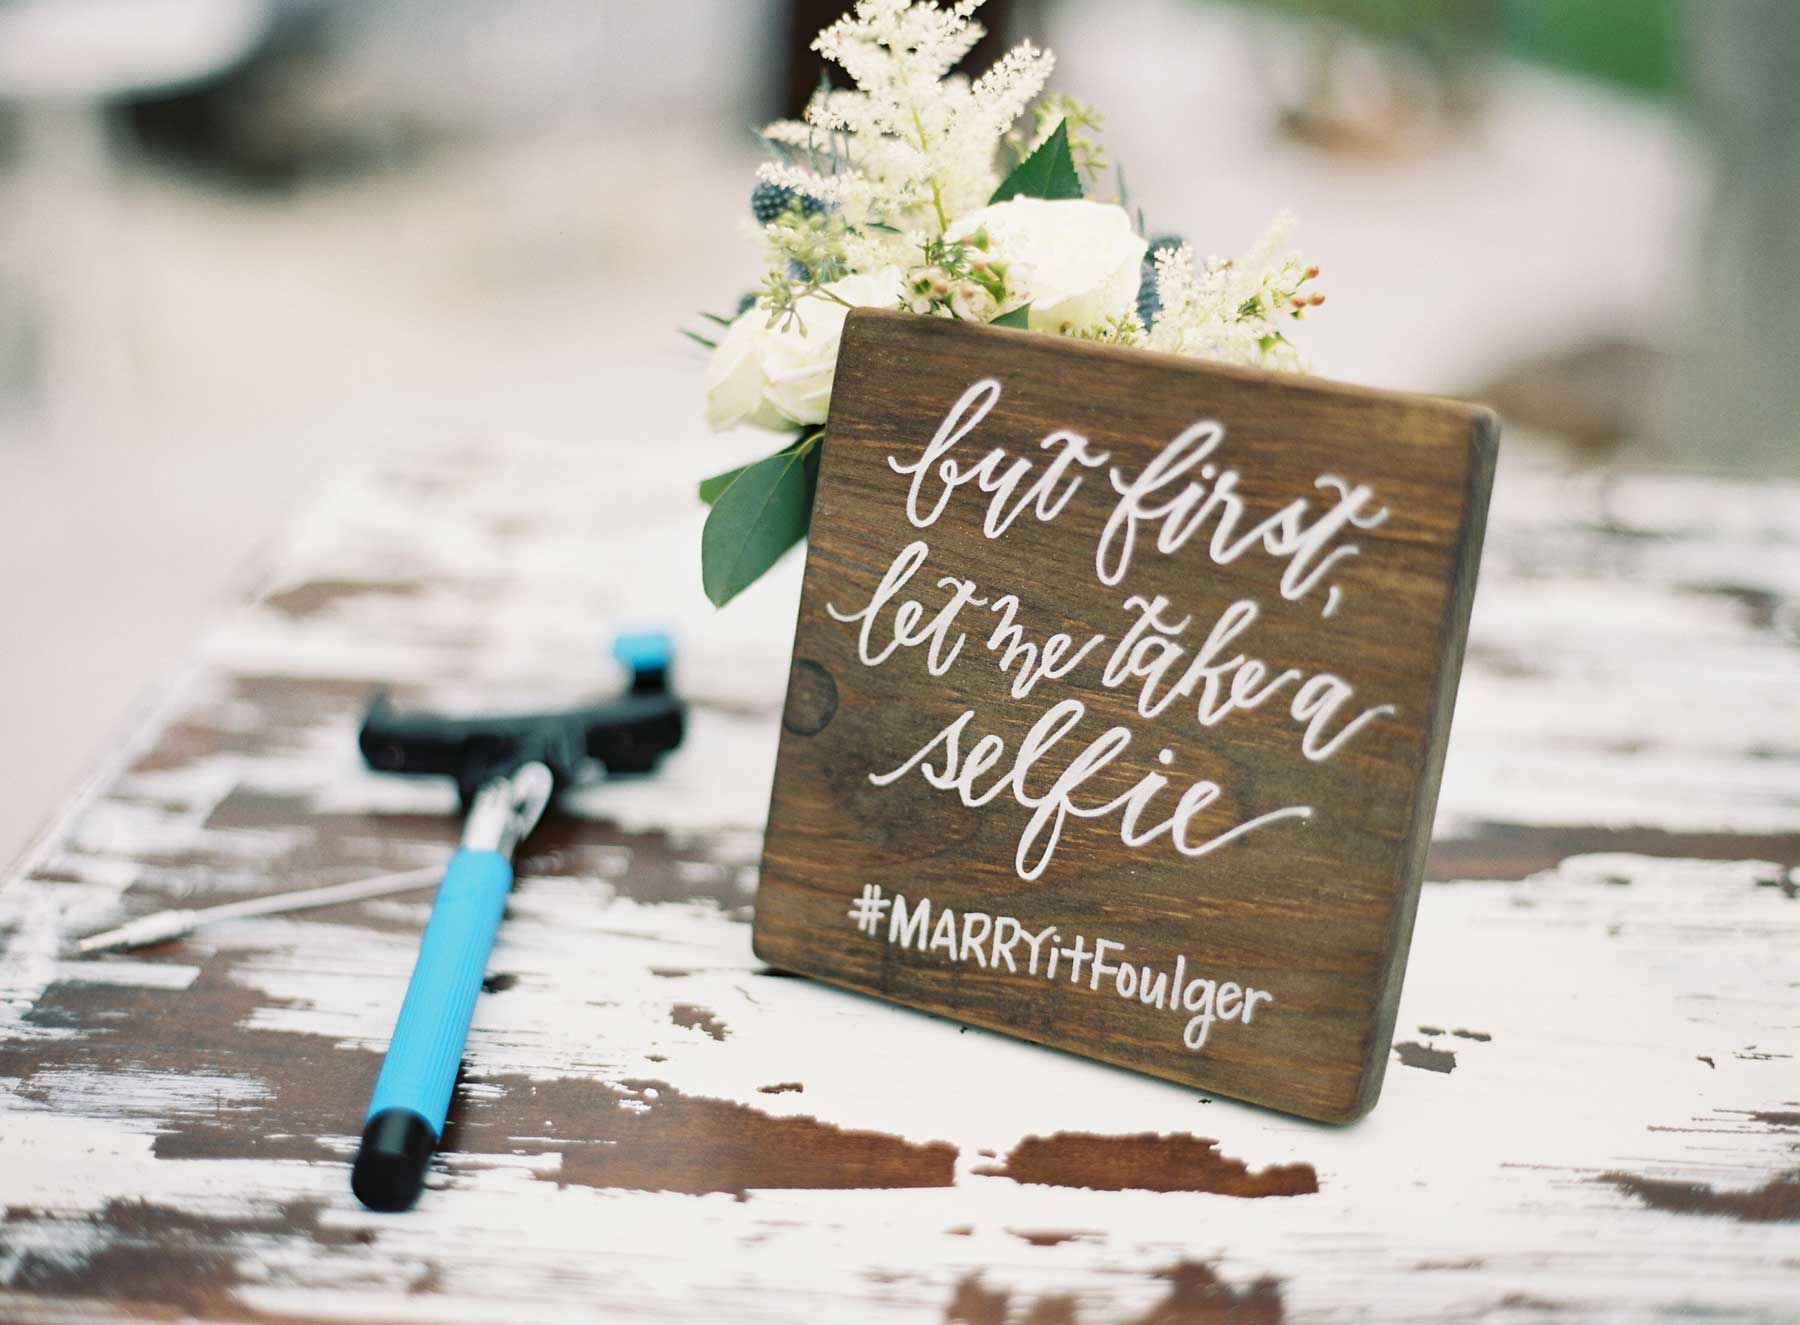 Wedding wood sign at reception wedding detail shot photography